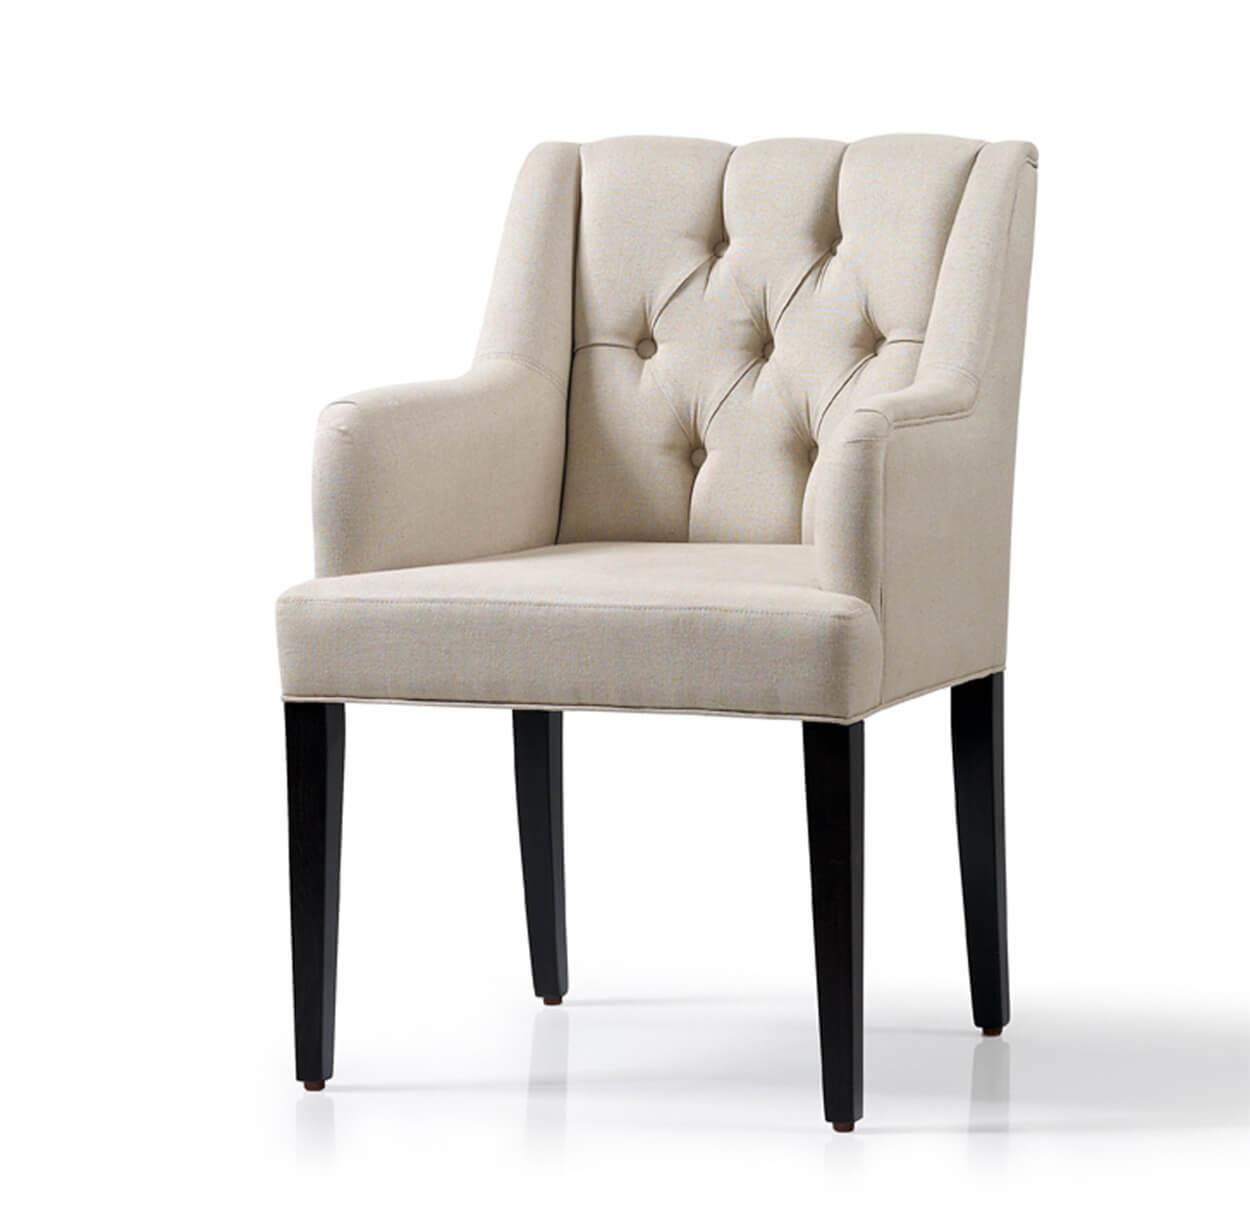 Linova eetkamerfauteuil - Mulleman meubelen